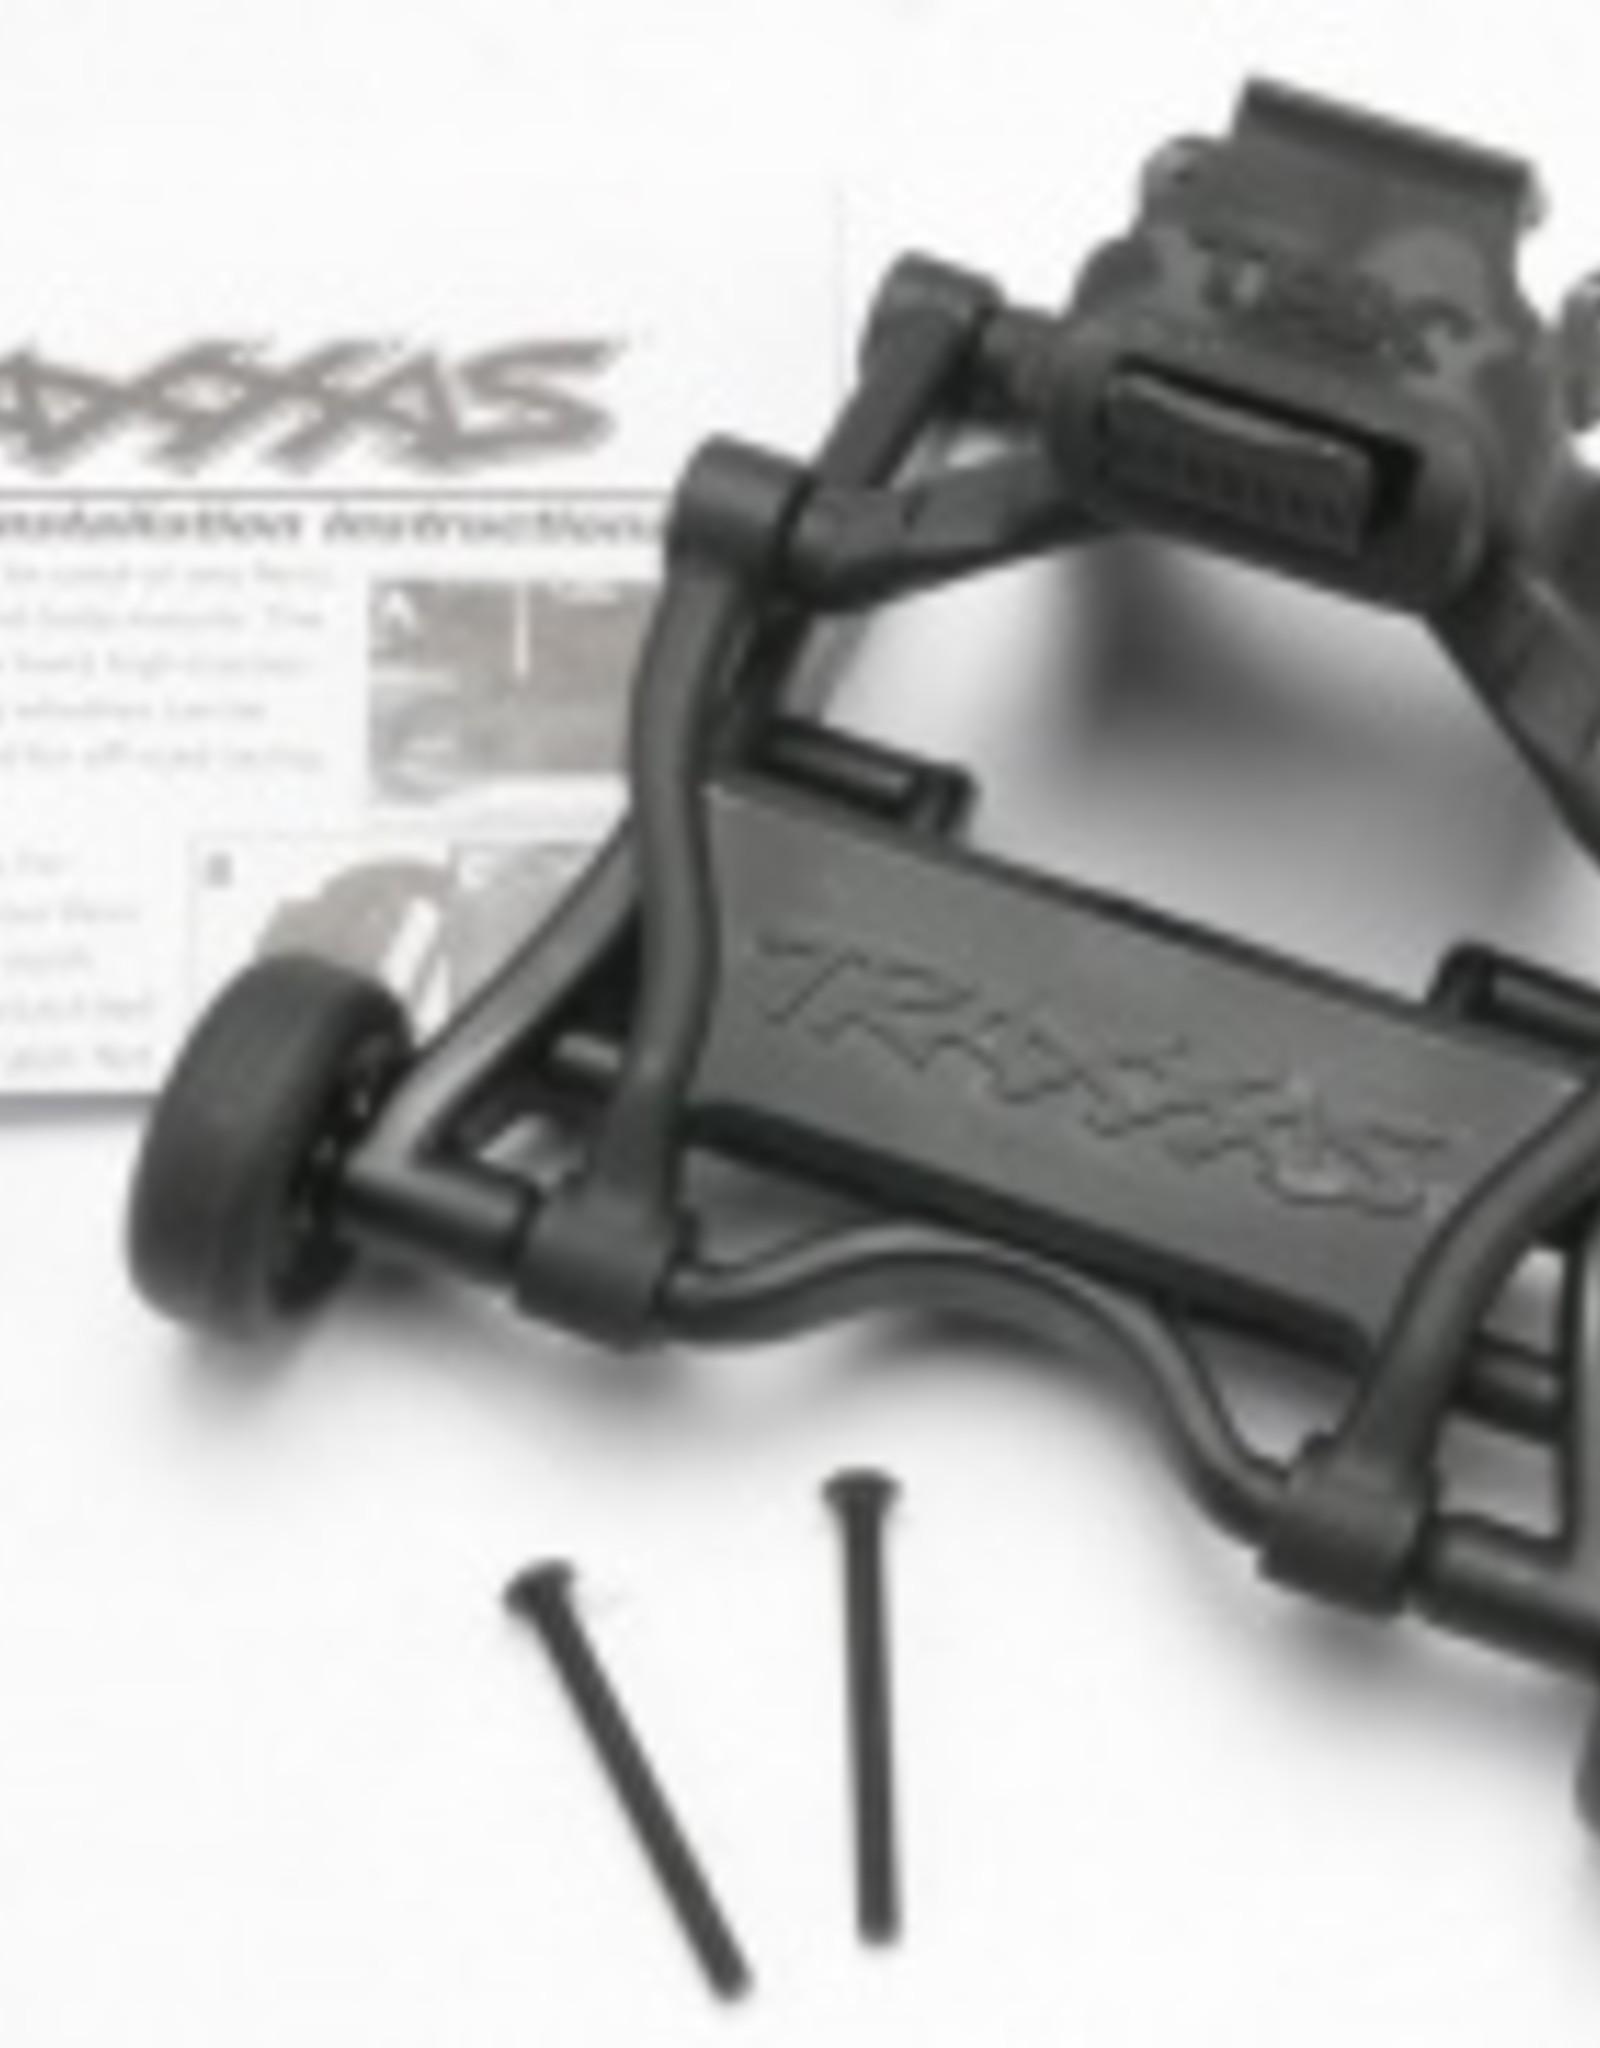 Traxxas Traxxas E-Revo Wheelie bar, assembled (fits all 1/10th scale Revo trucks)